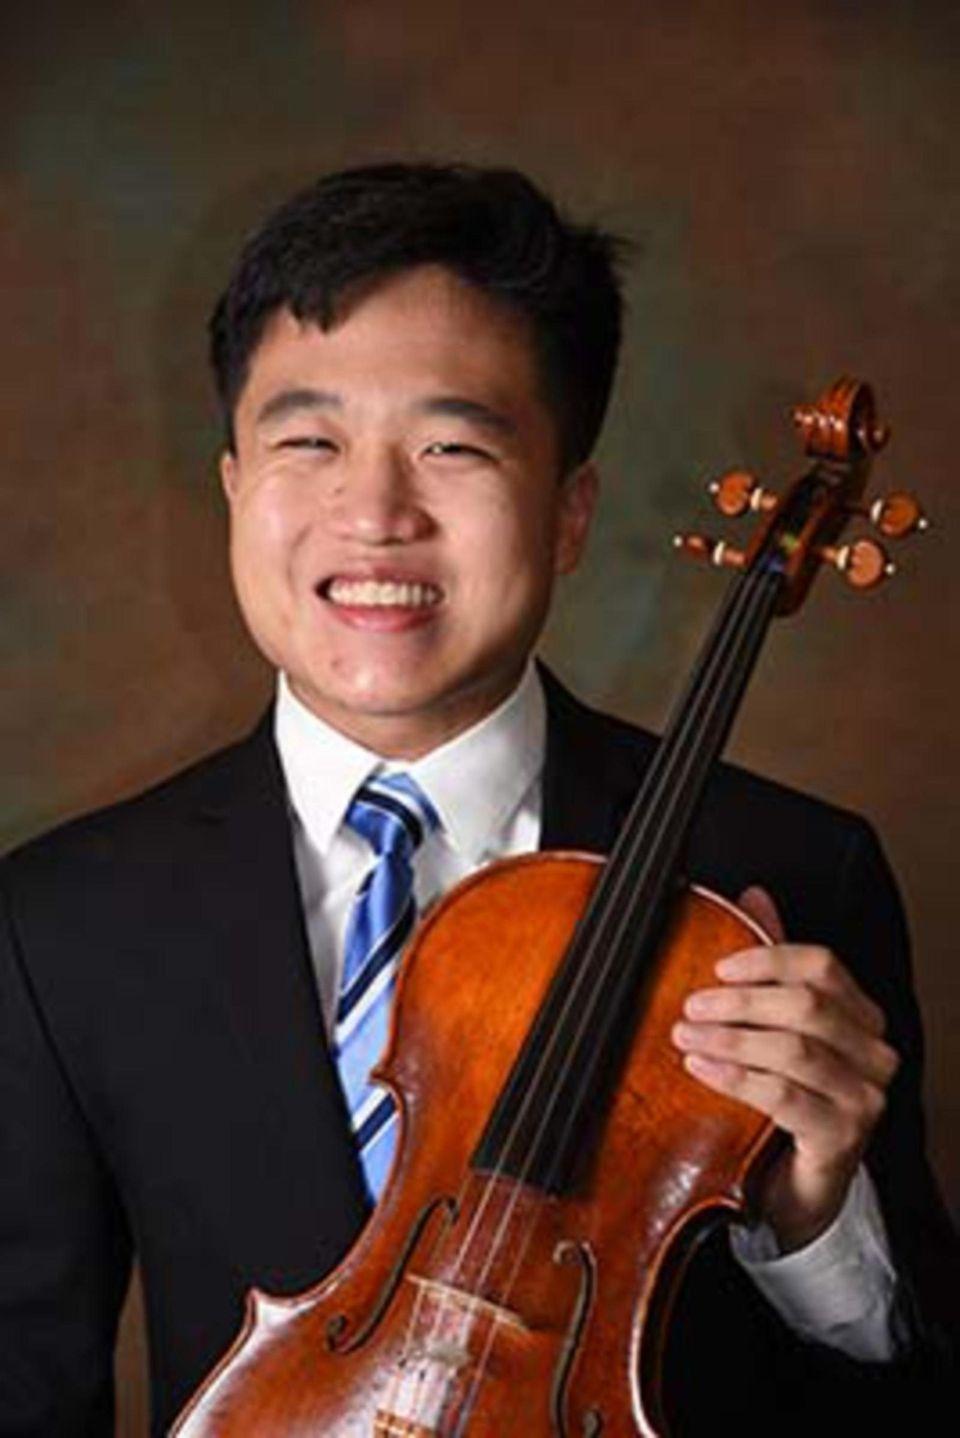 The versatility of Joshua Cai's music skills extends